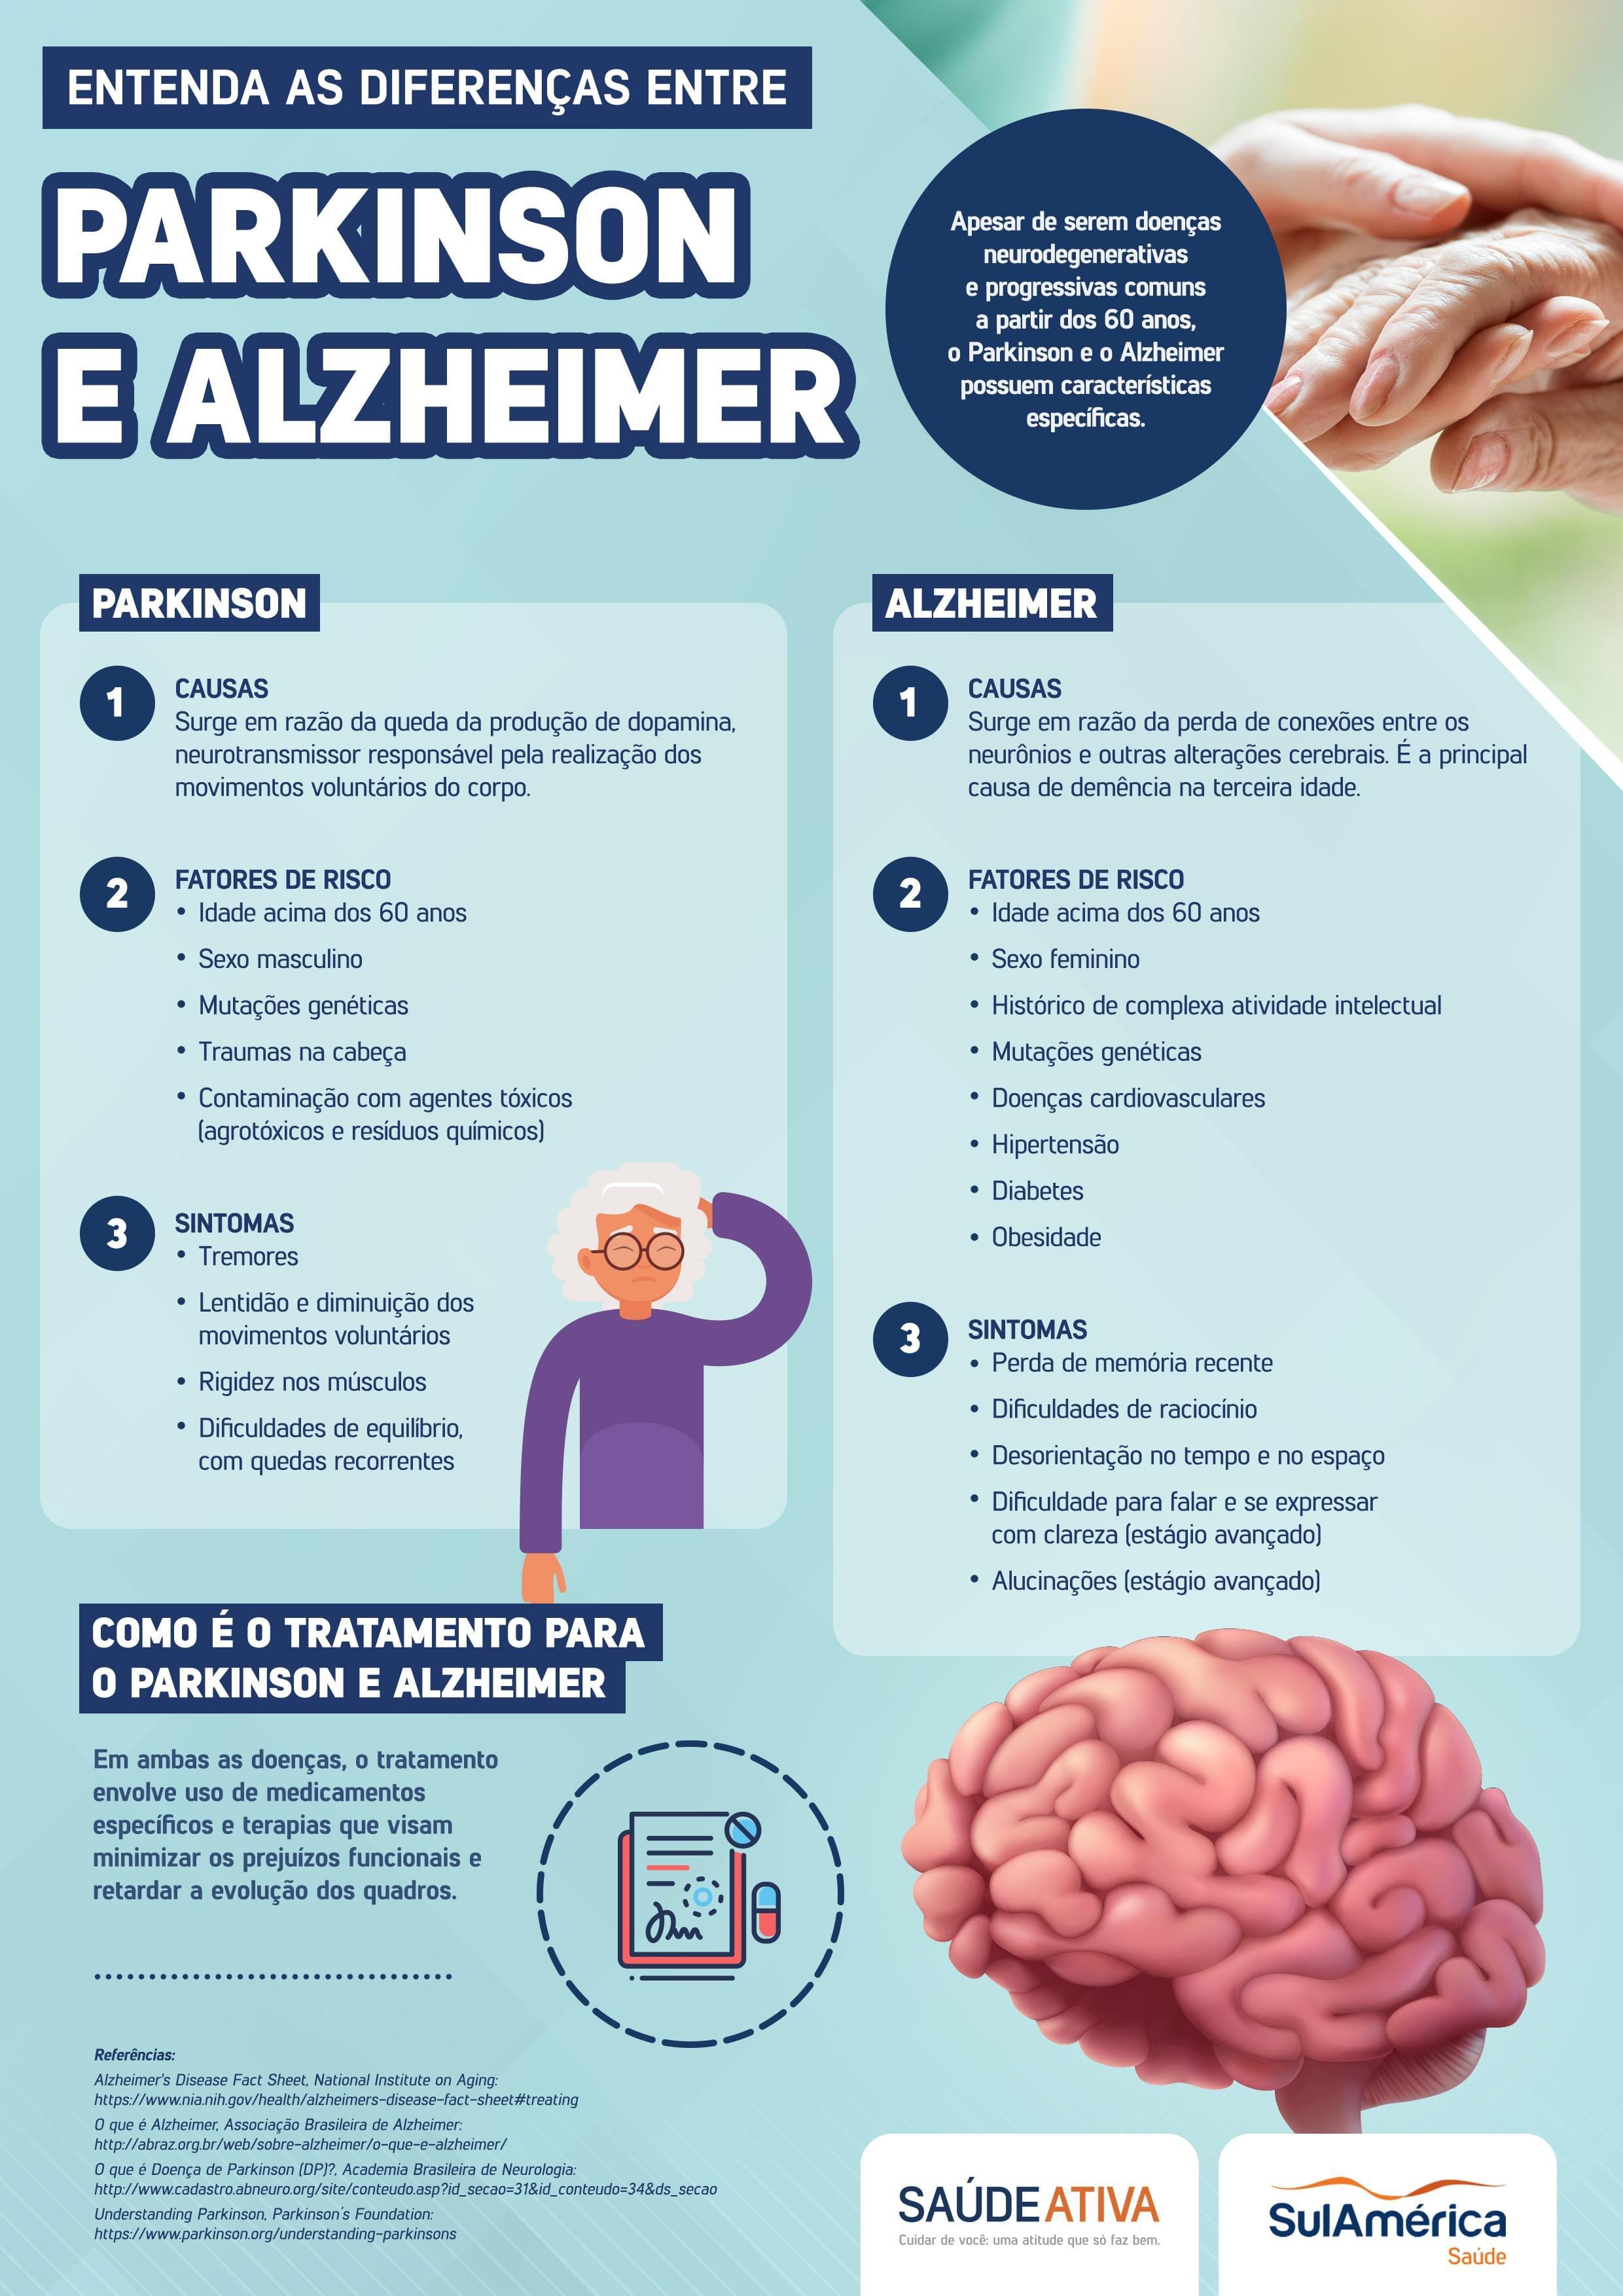 Diferenças entre Alzheimer e Parkinson